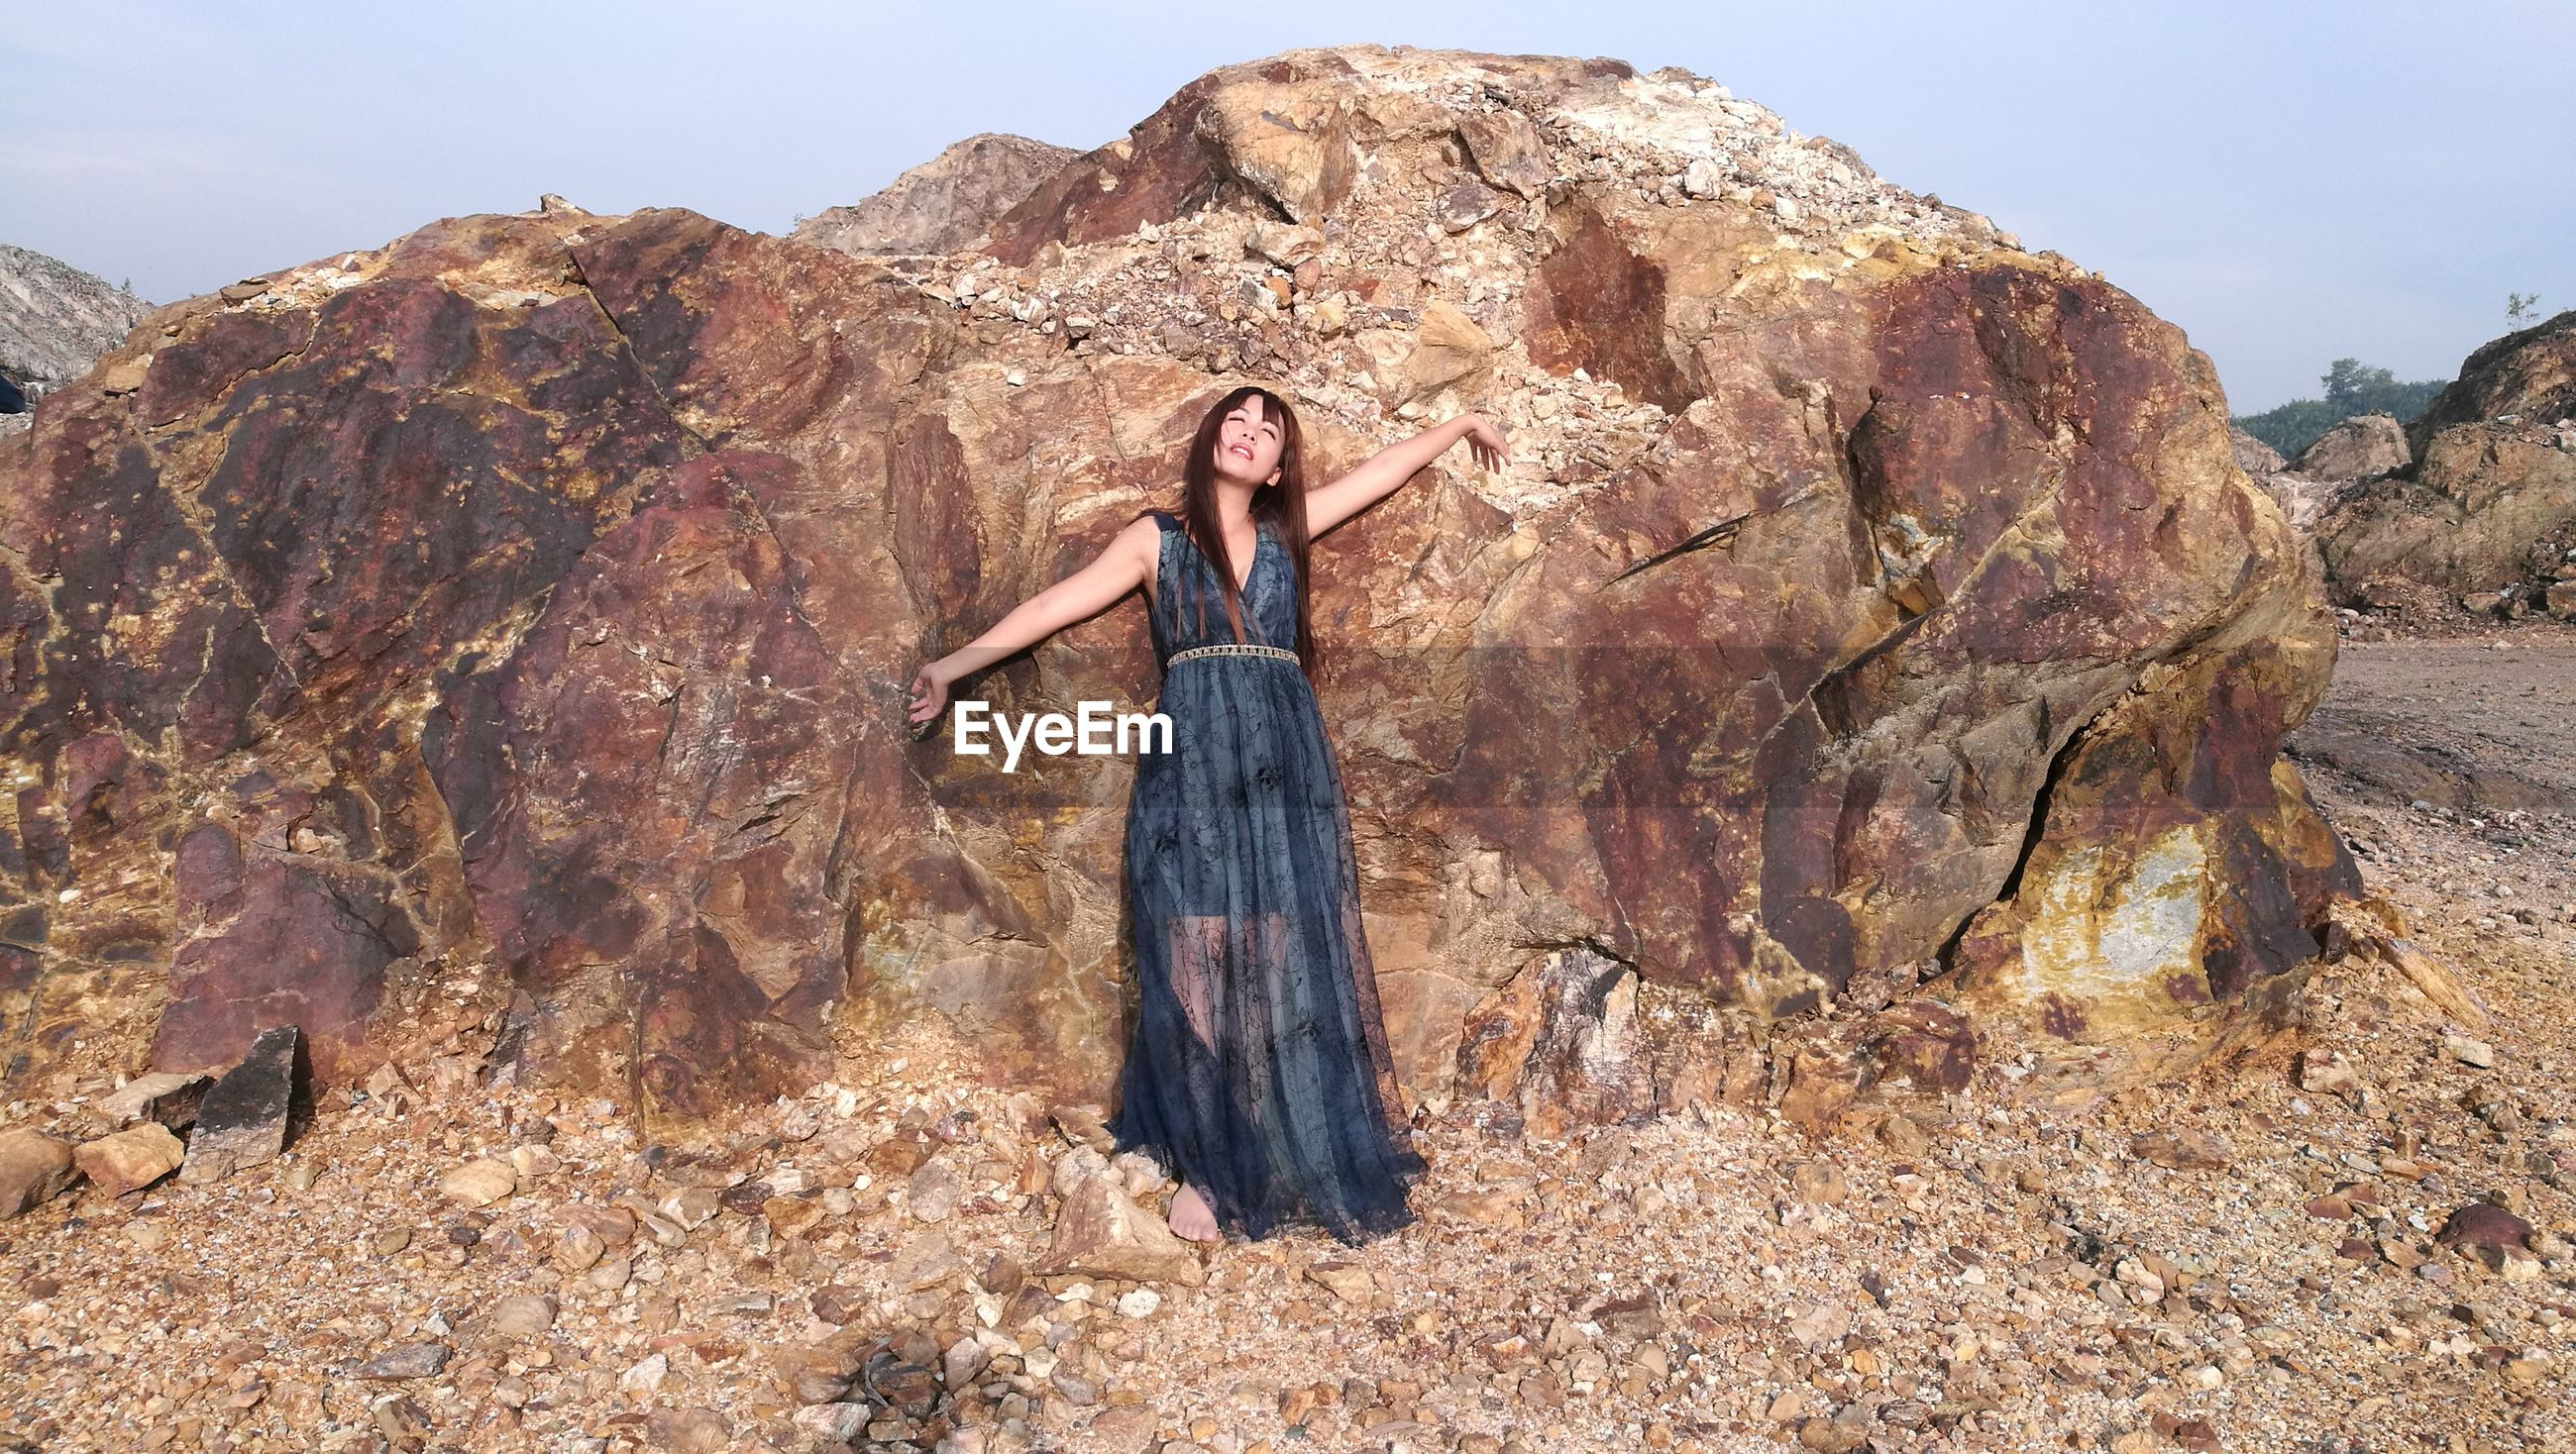 Full length of woman standing against rock